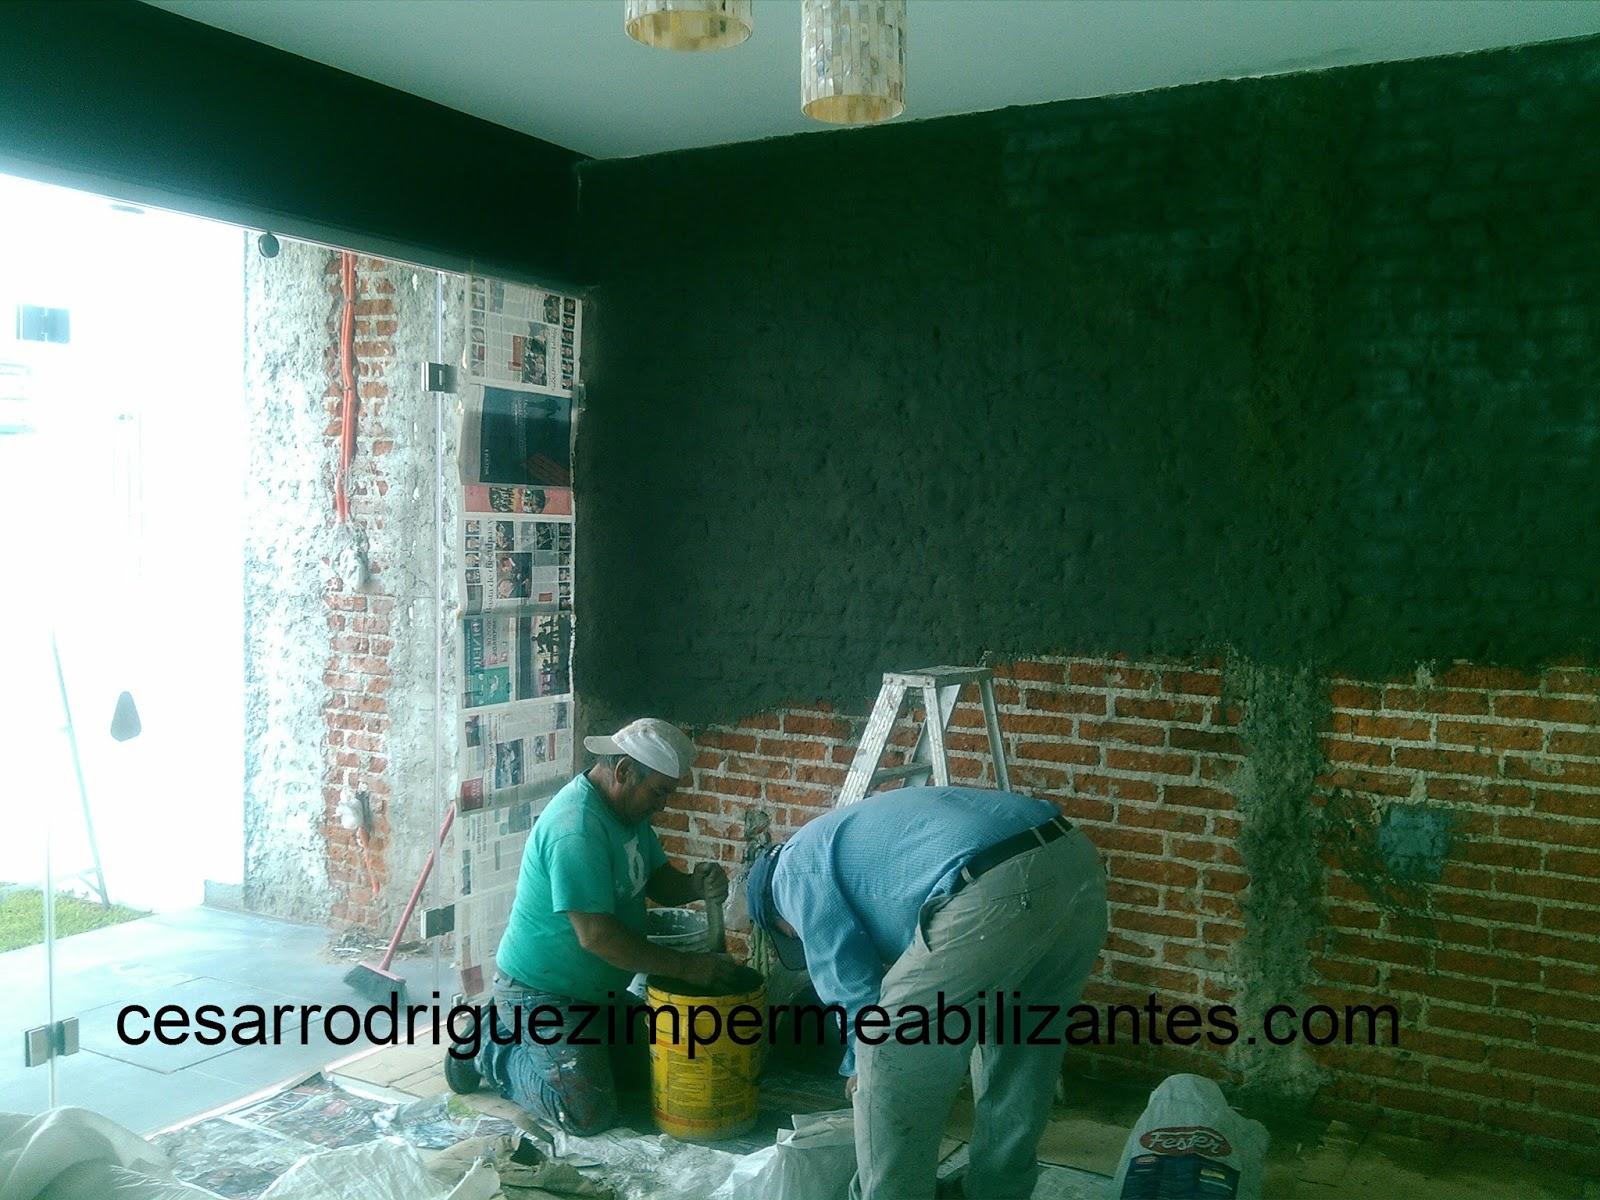 Soluciones inmediatas en impermeabilizaci n - Impermeabilizante para paredes ...